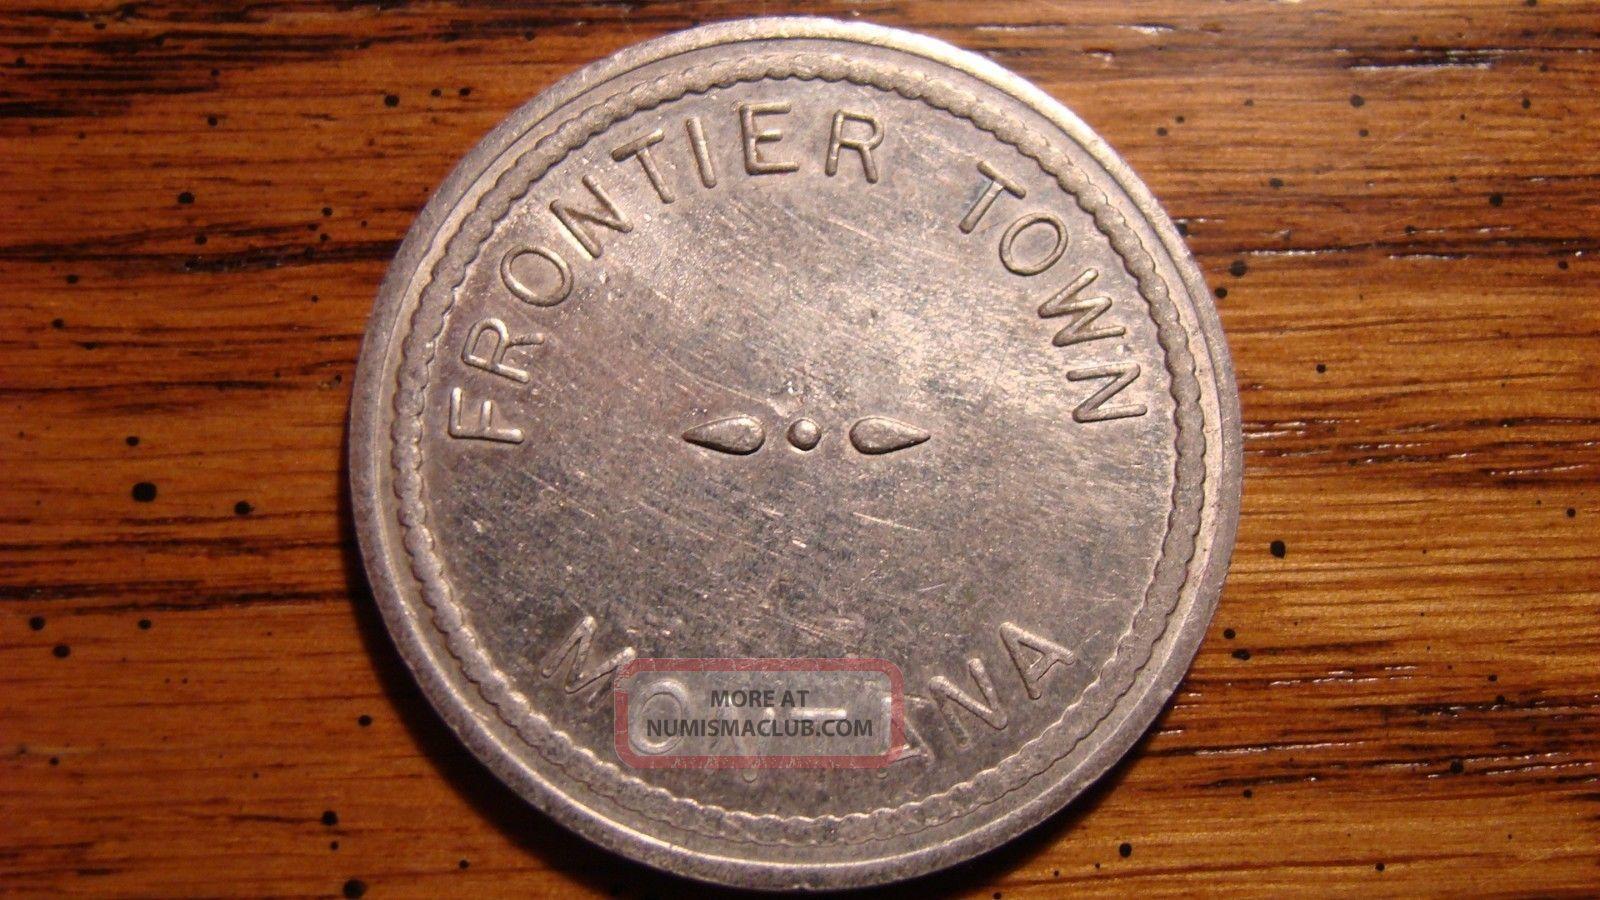 Frontier Town Montana Mt 25¢ Aluminum Trade Token 1900s Exonumia photo